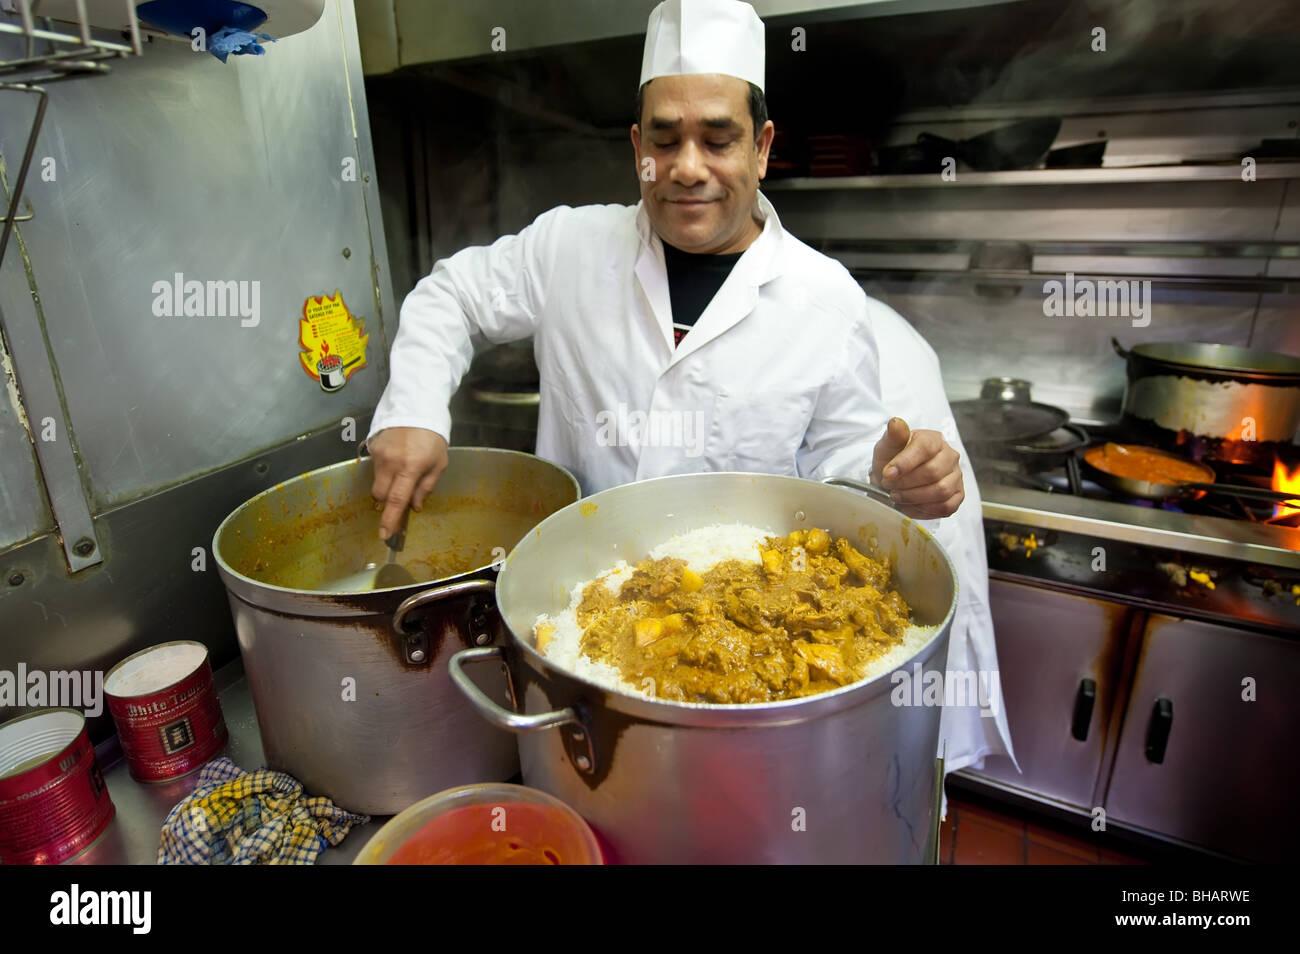 Restaurant Kitchen Chefs indian chef cooking in a restaurant kitchen stock photo, royalty